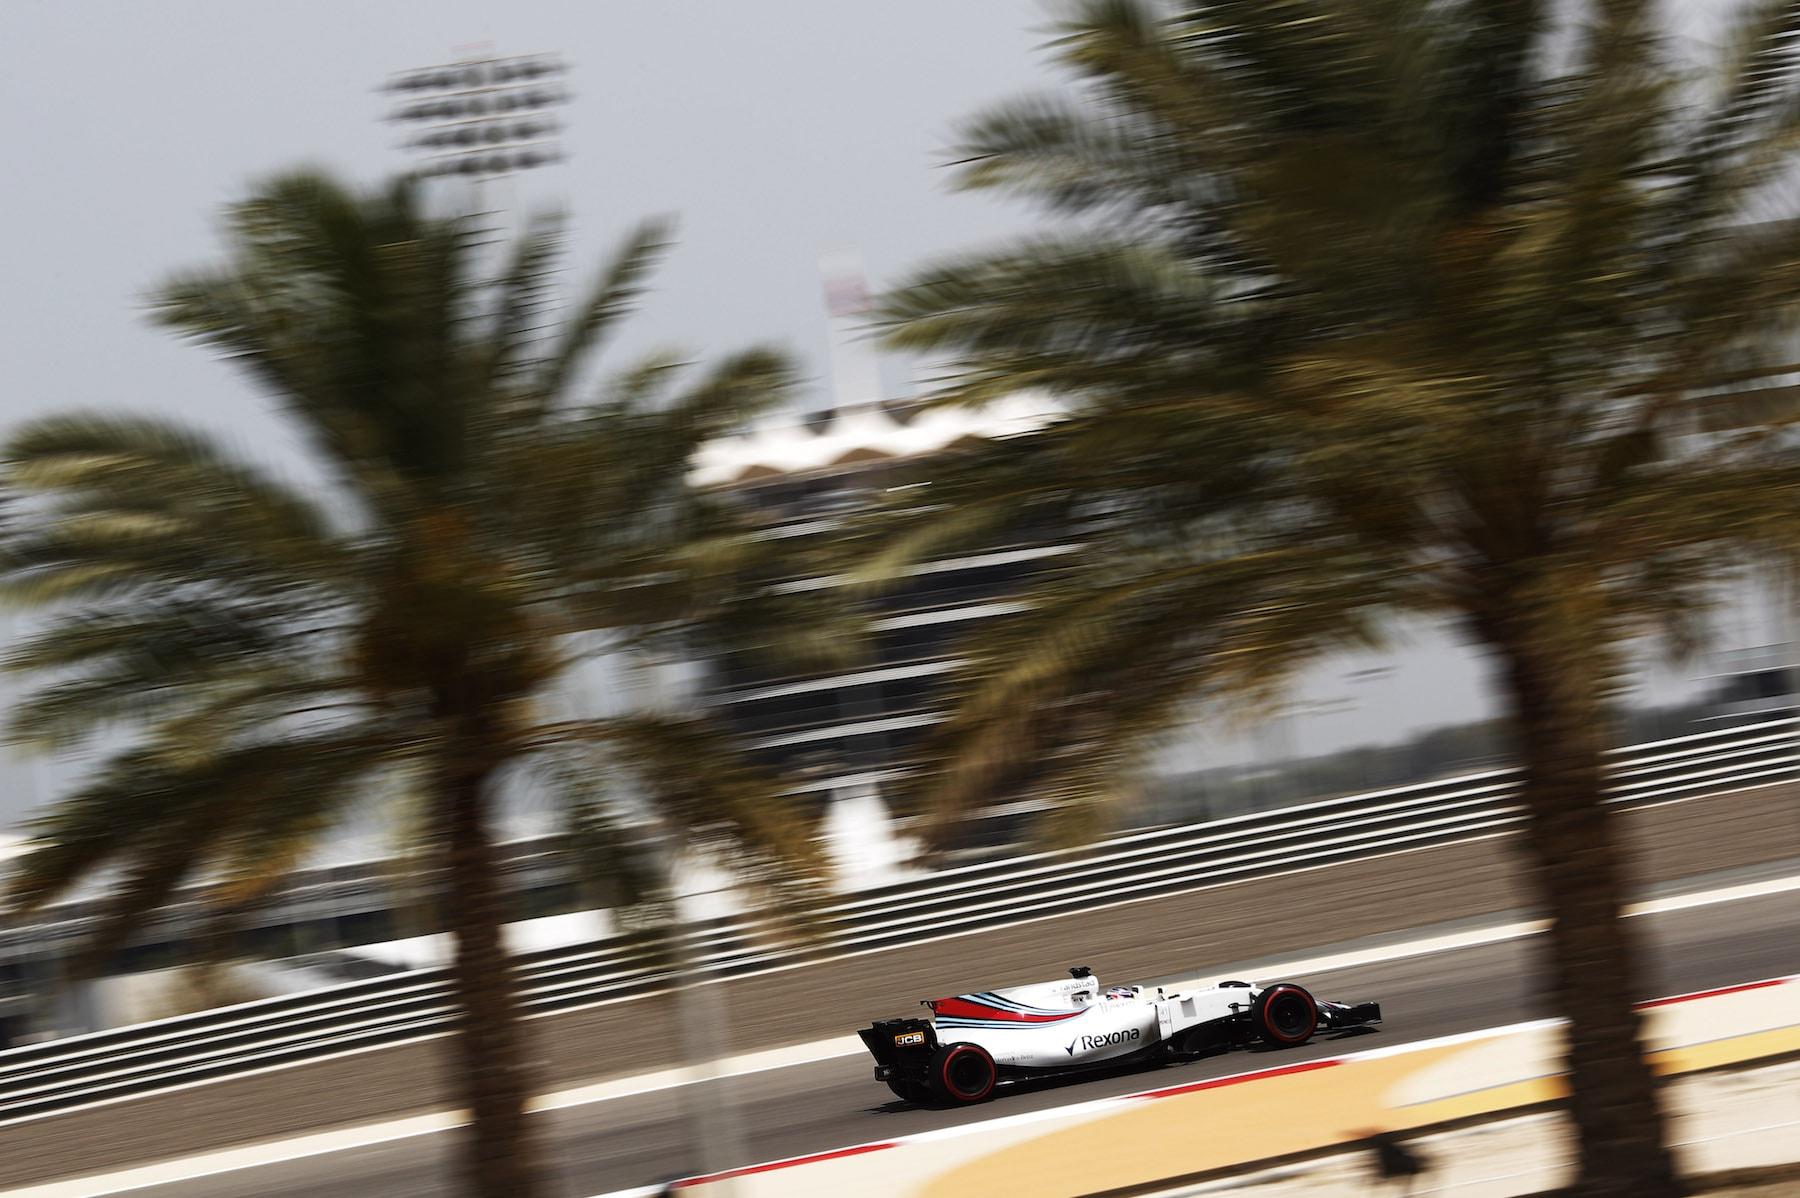 2017 Gary Paffett | Williams FW40 | 2017 Bahrain Test 1 copy.jpg